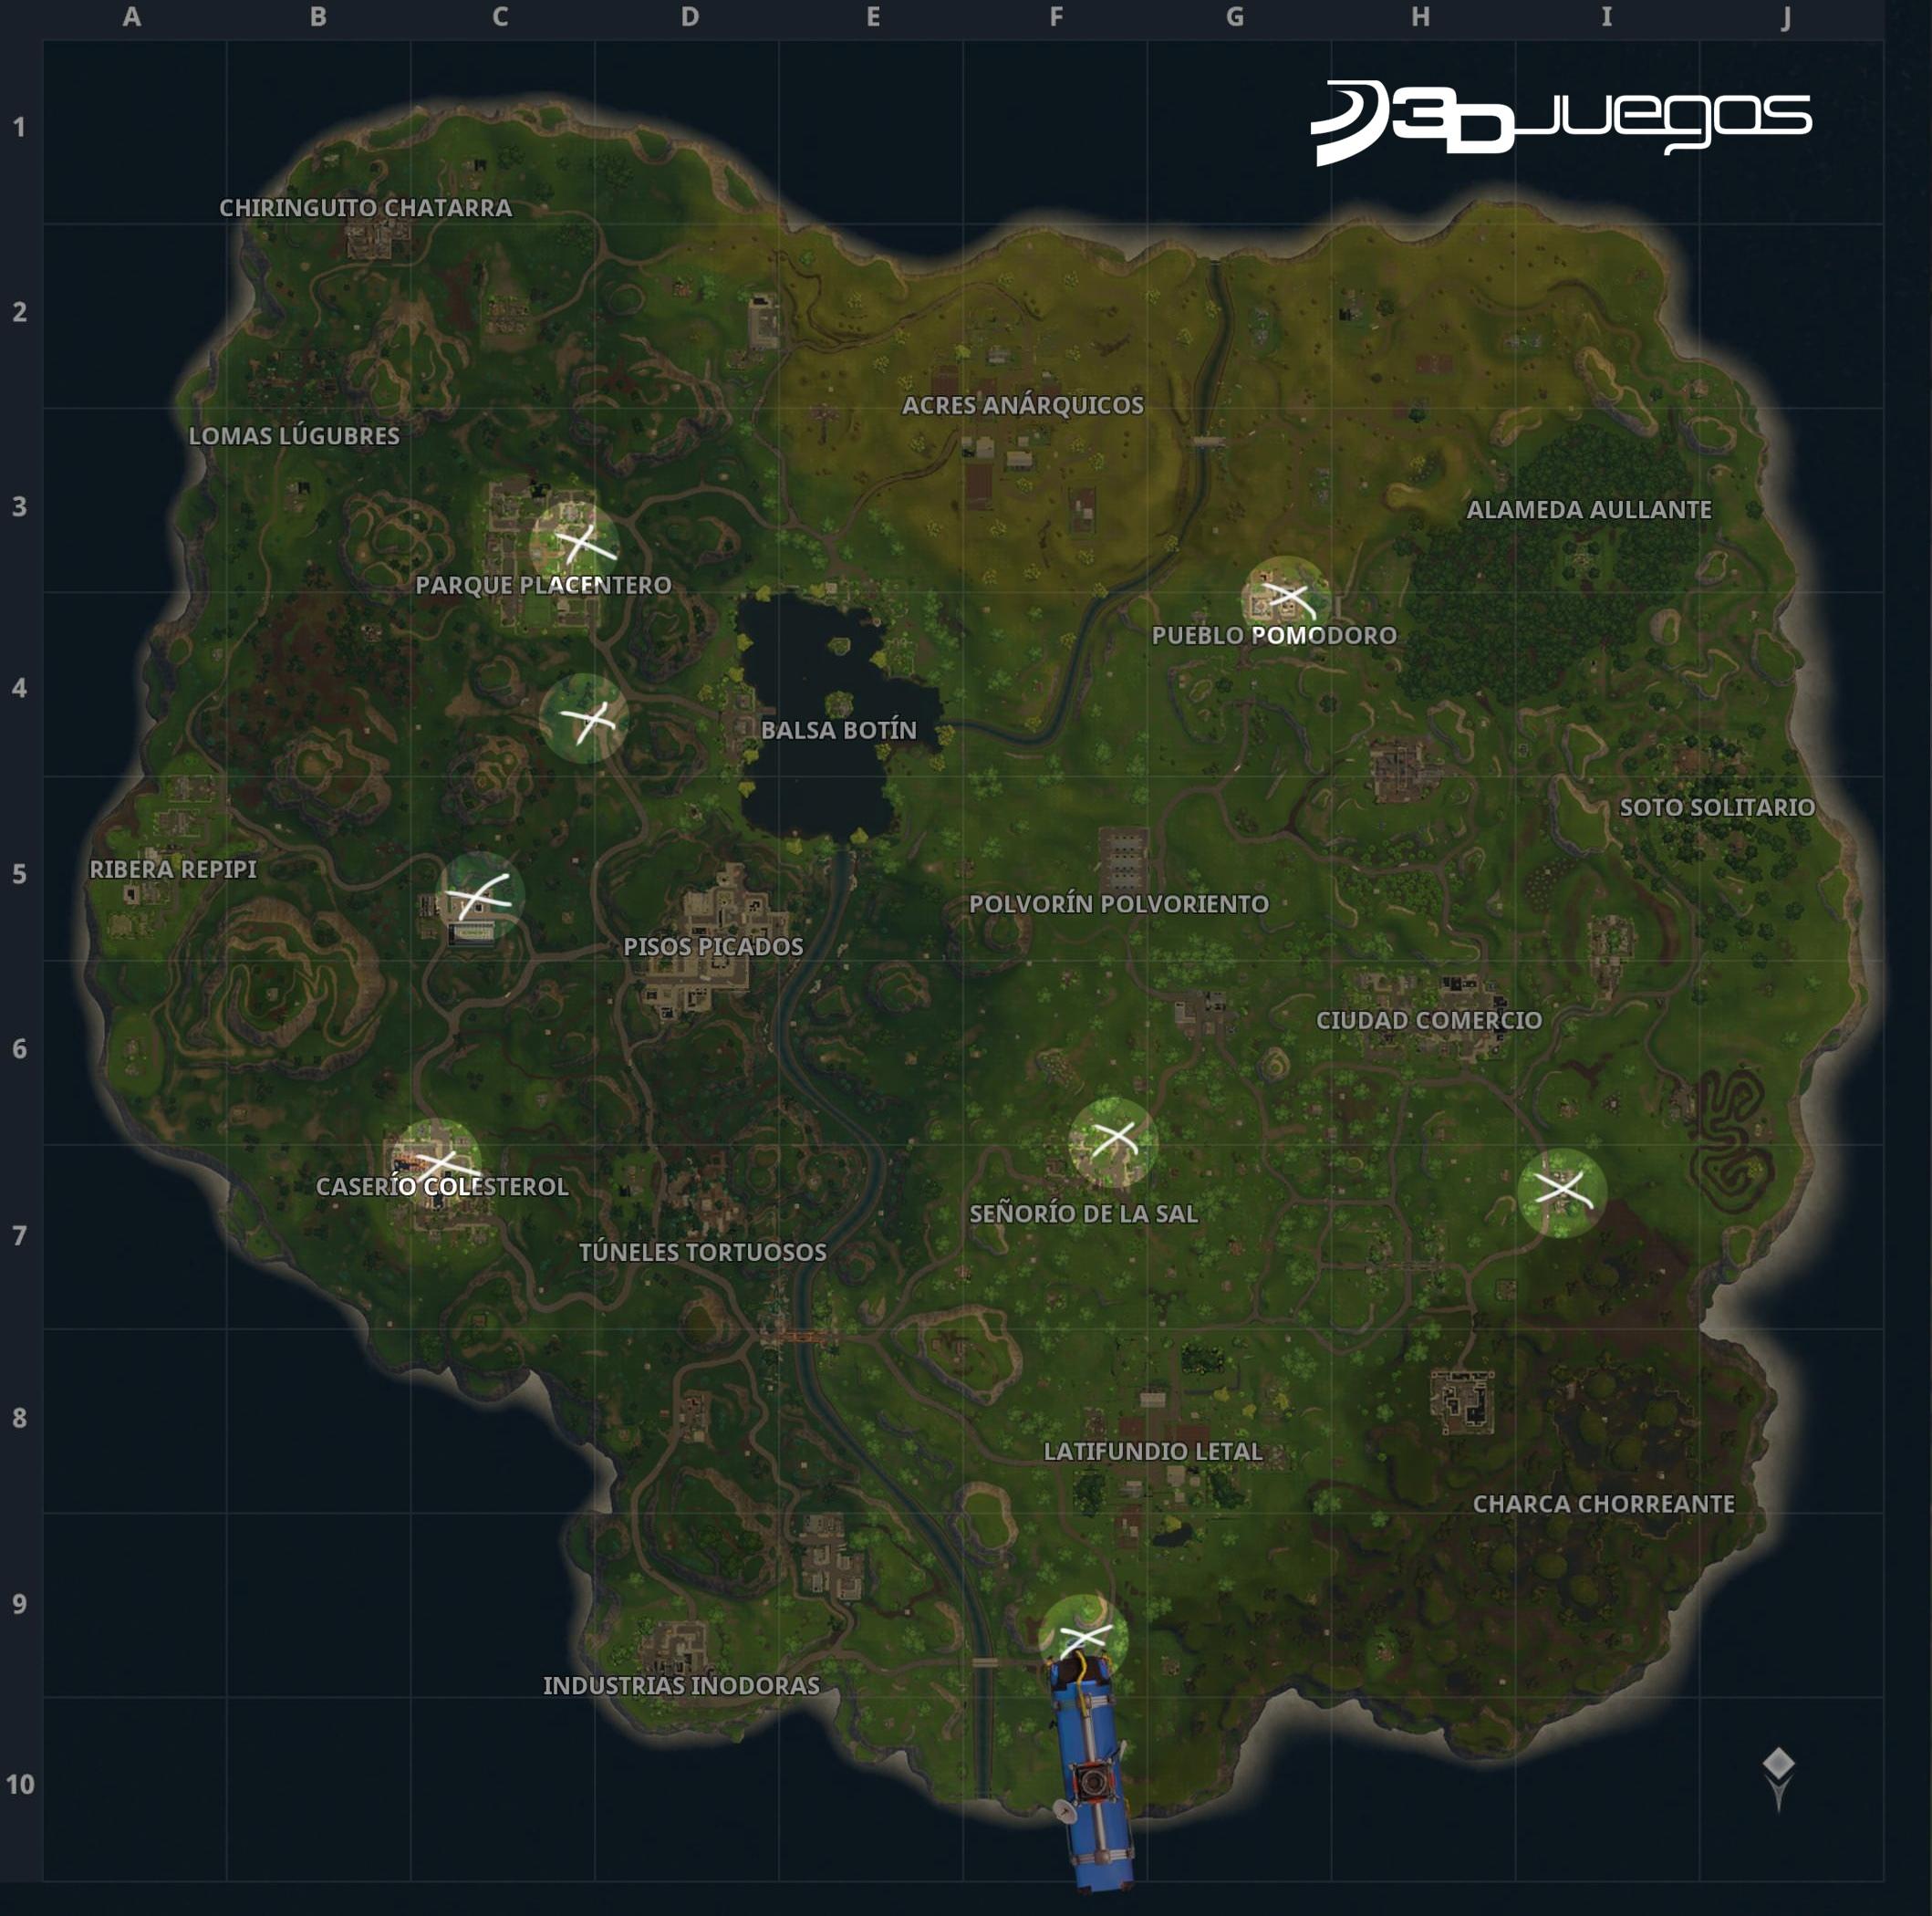 Mapa Fortnite Temporada 5 Español.Desafios Del Pase De Batalla De Fortnite Temporada 3 Semana 5